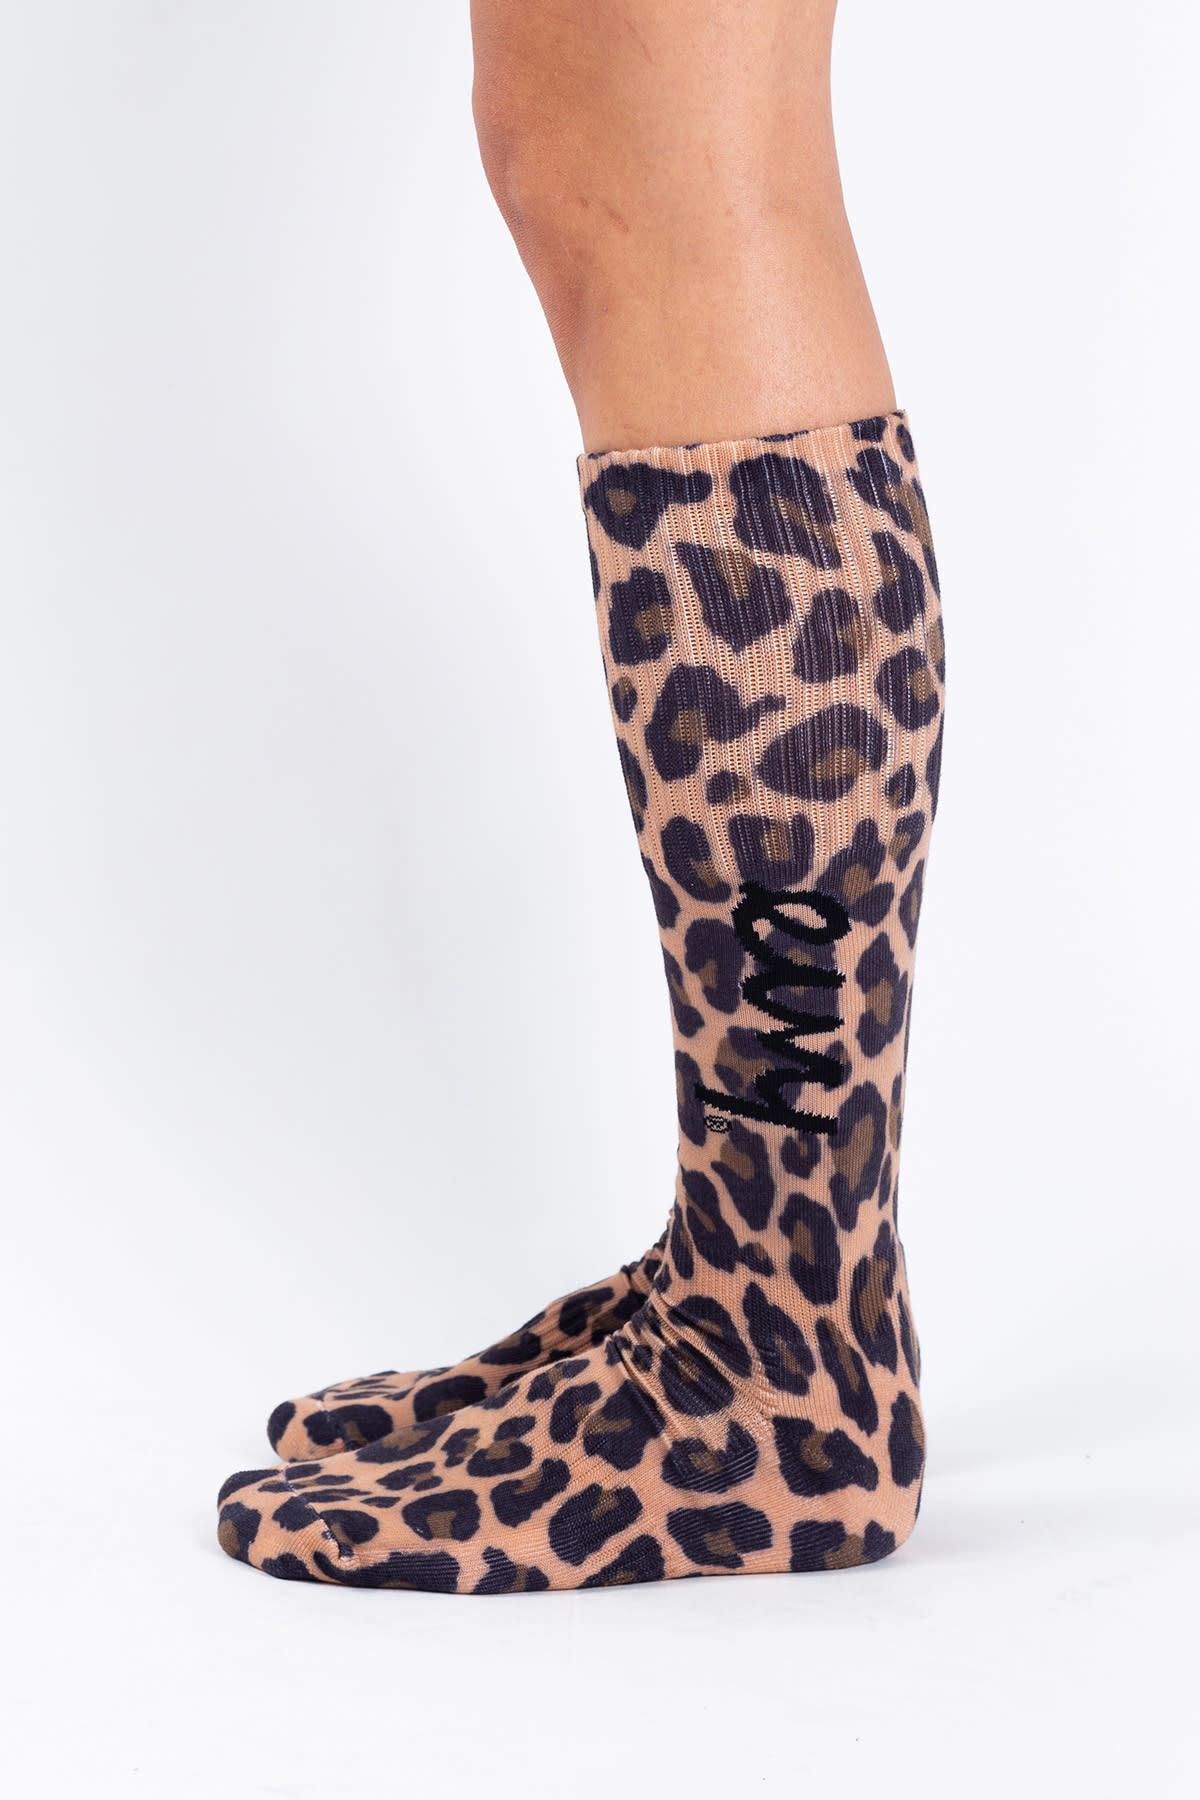 Eivy Eivy Women's Mountain Sock